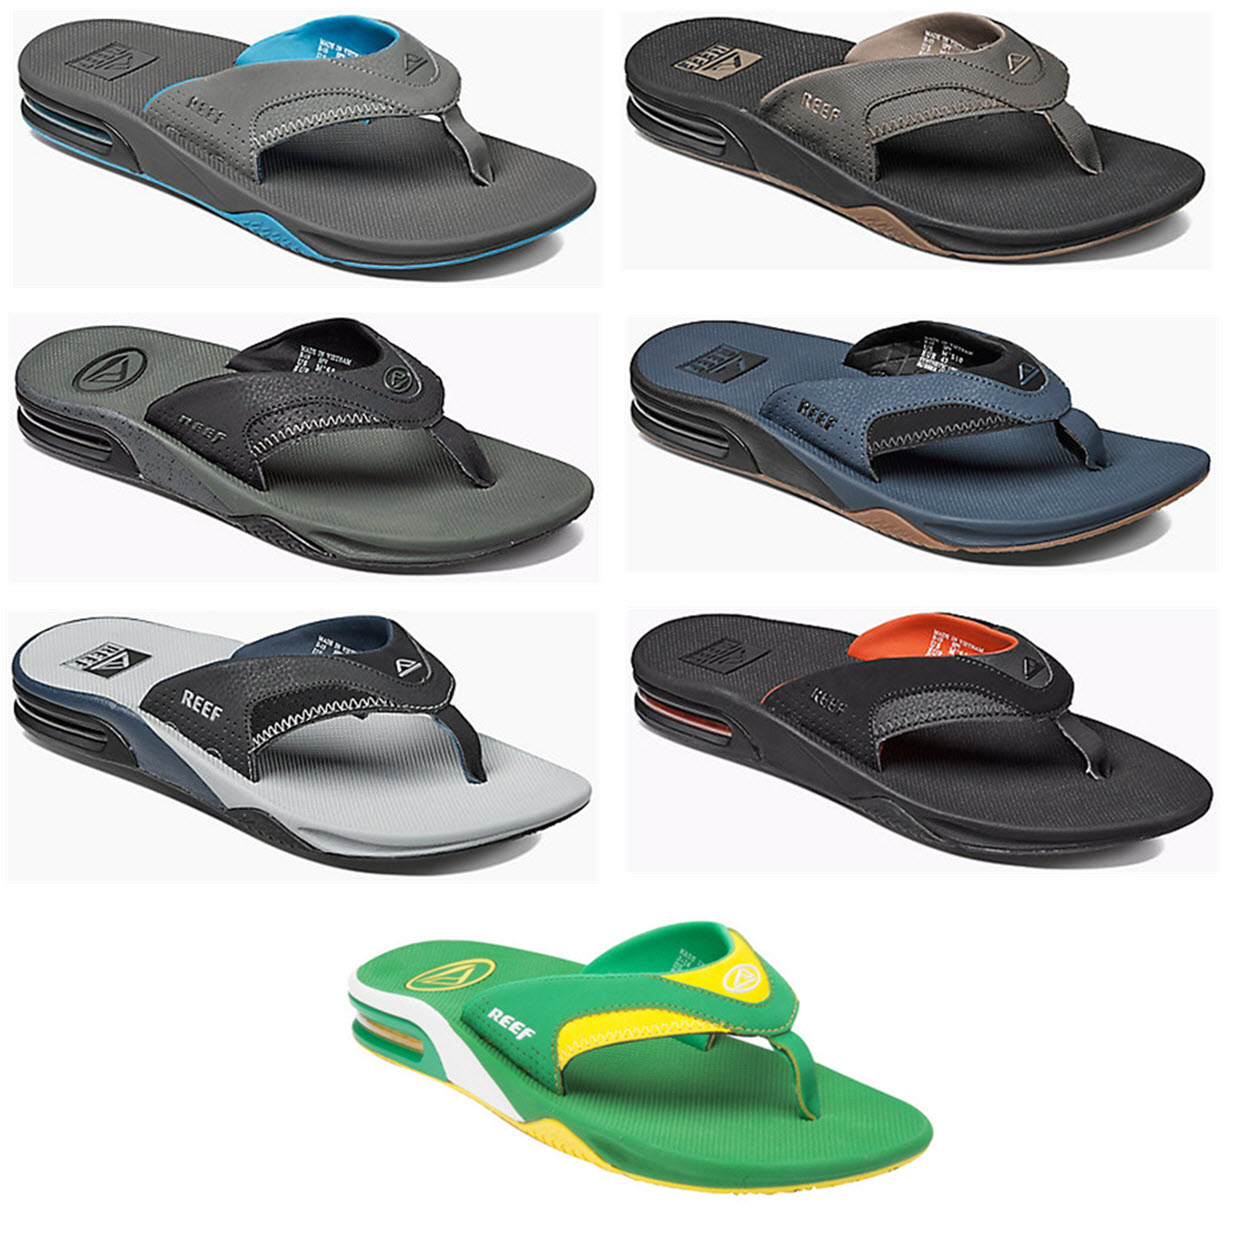 7f2fb047619 Details about Reef Sandal - Fanning Flip Flops - Mick Fanning Pro Model